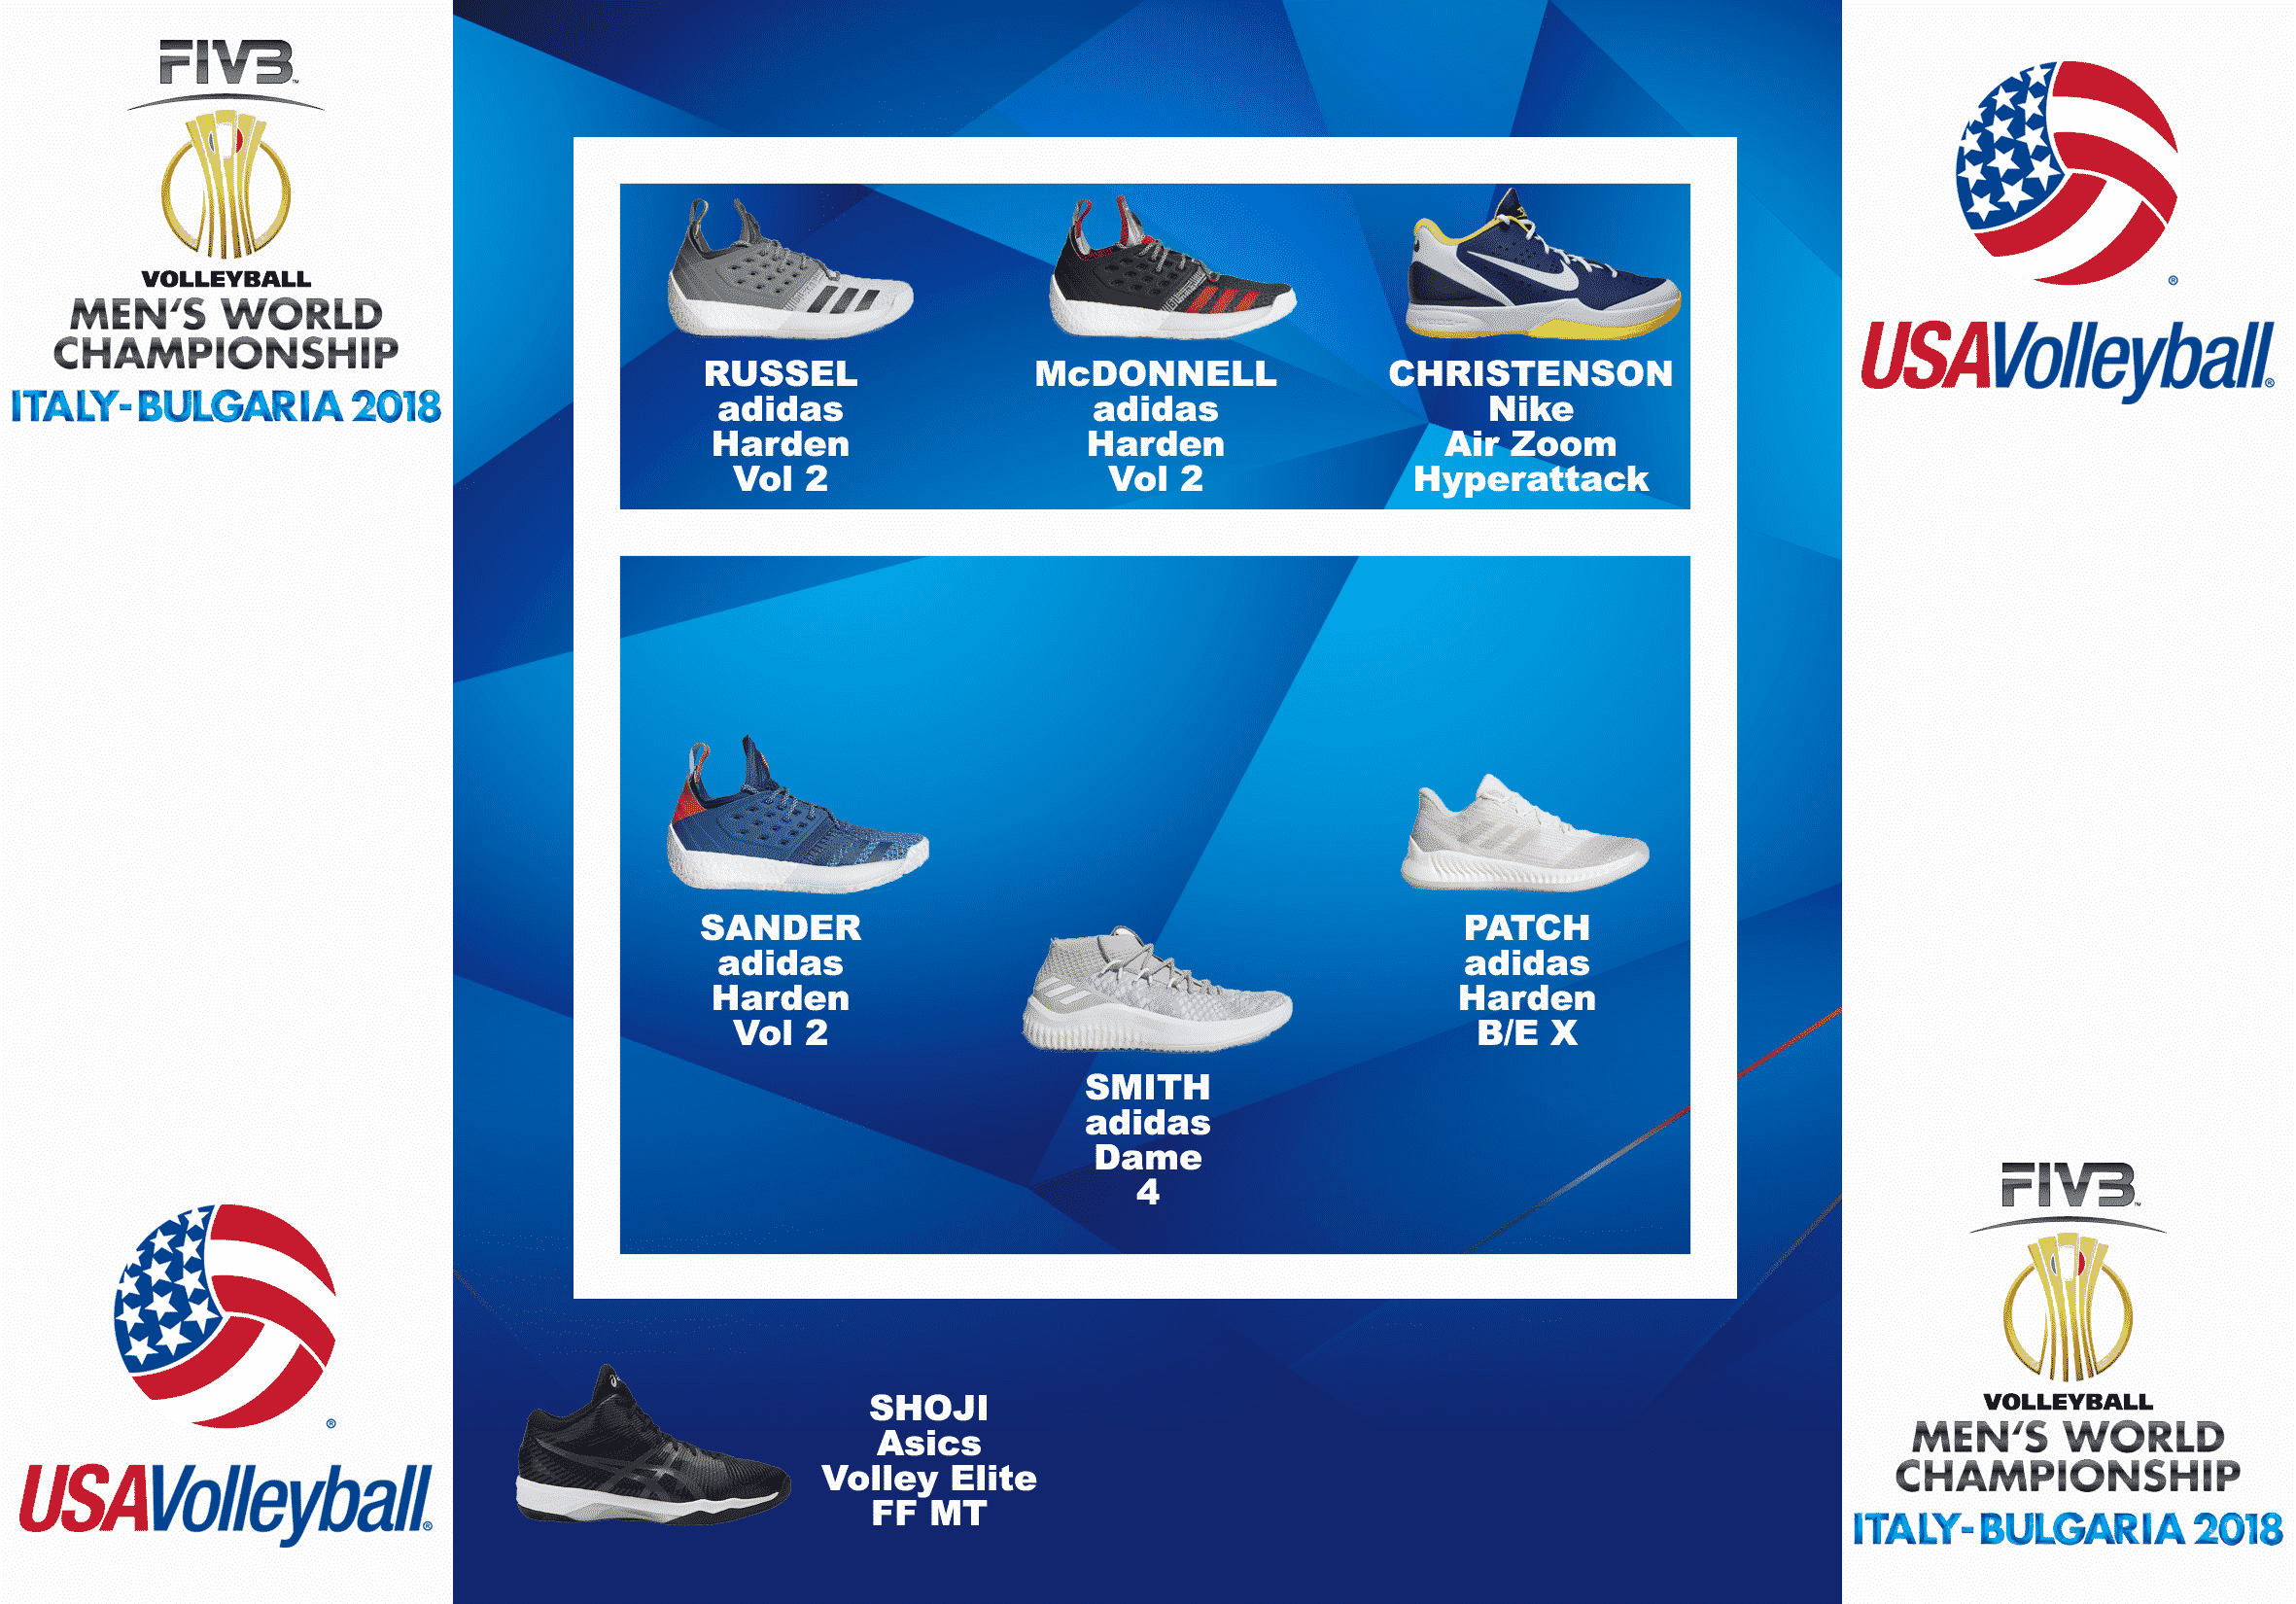 compo-chaussures-volley-USA-championnat-du-monde-2018